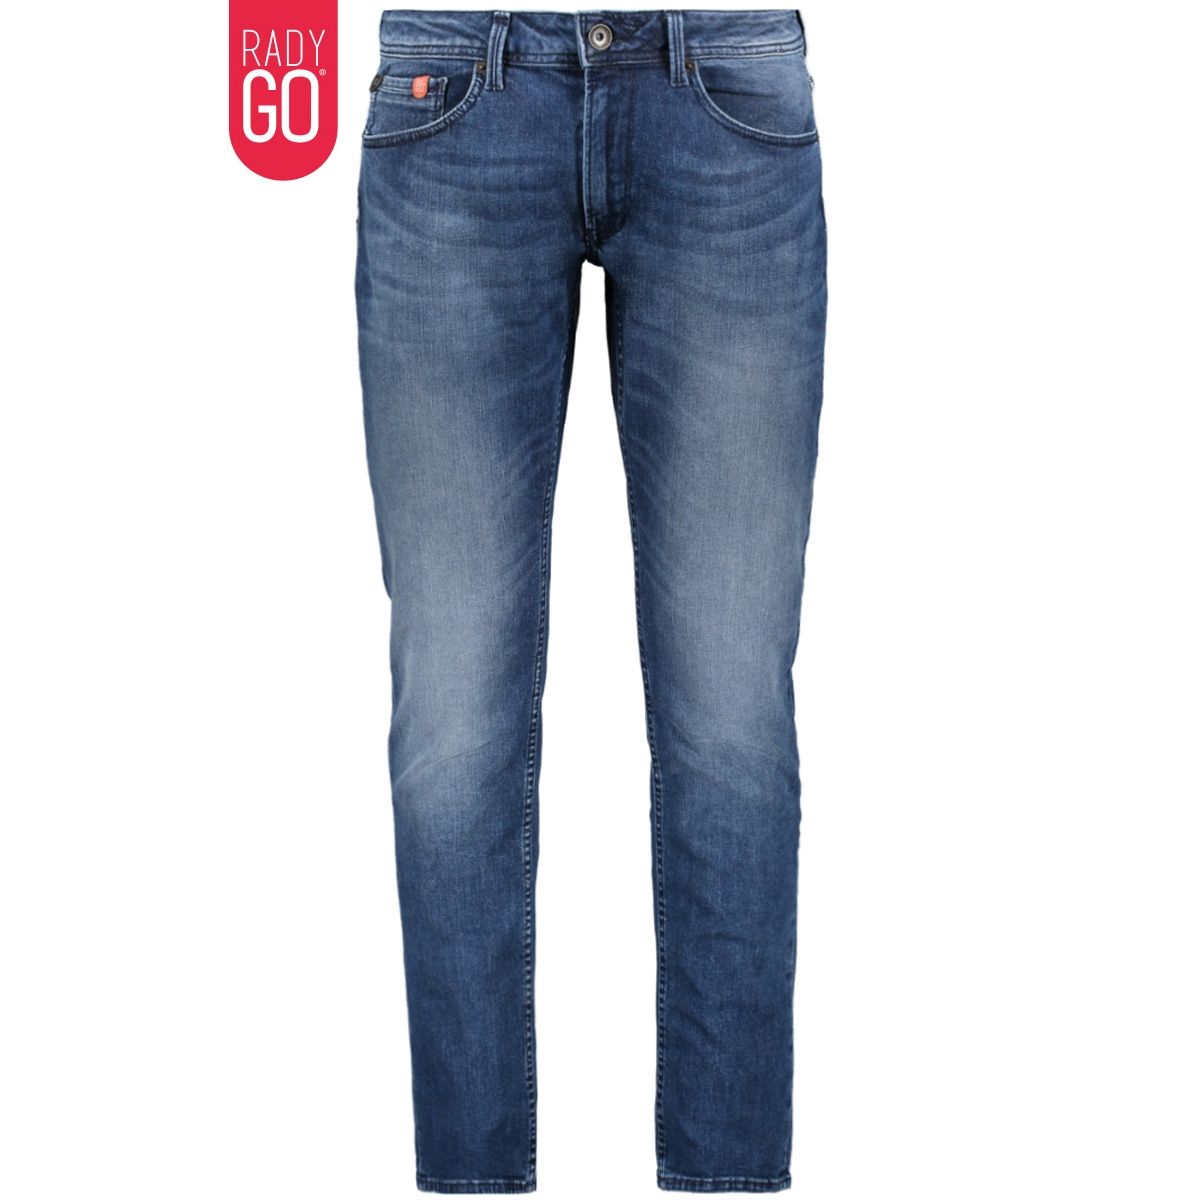 613 russo tapered garcia jeans 5803 motion denim medium used